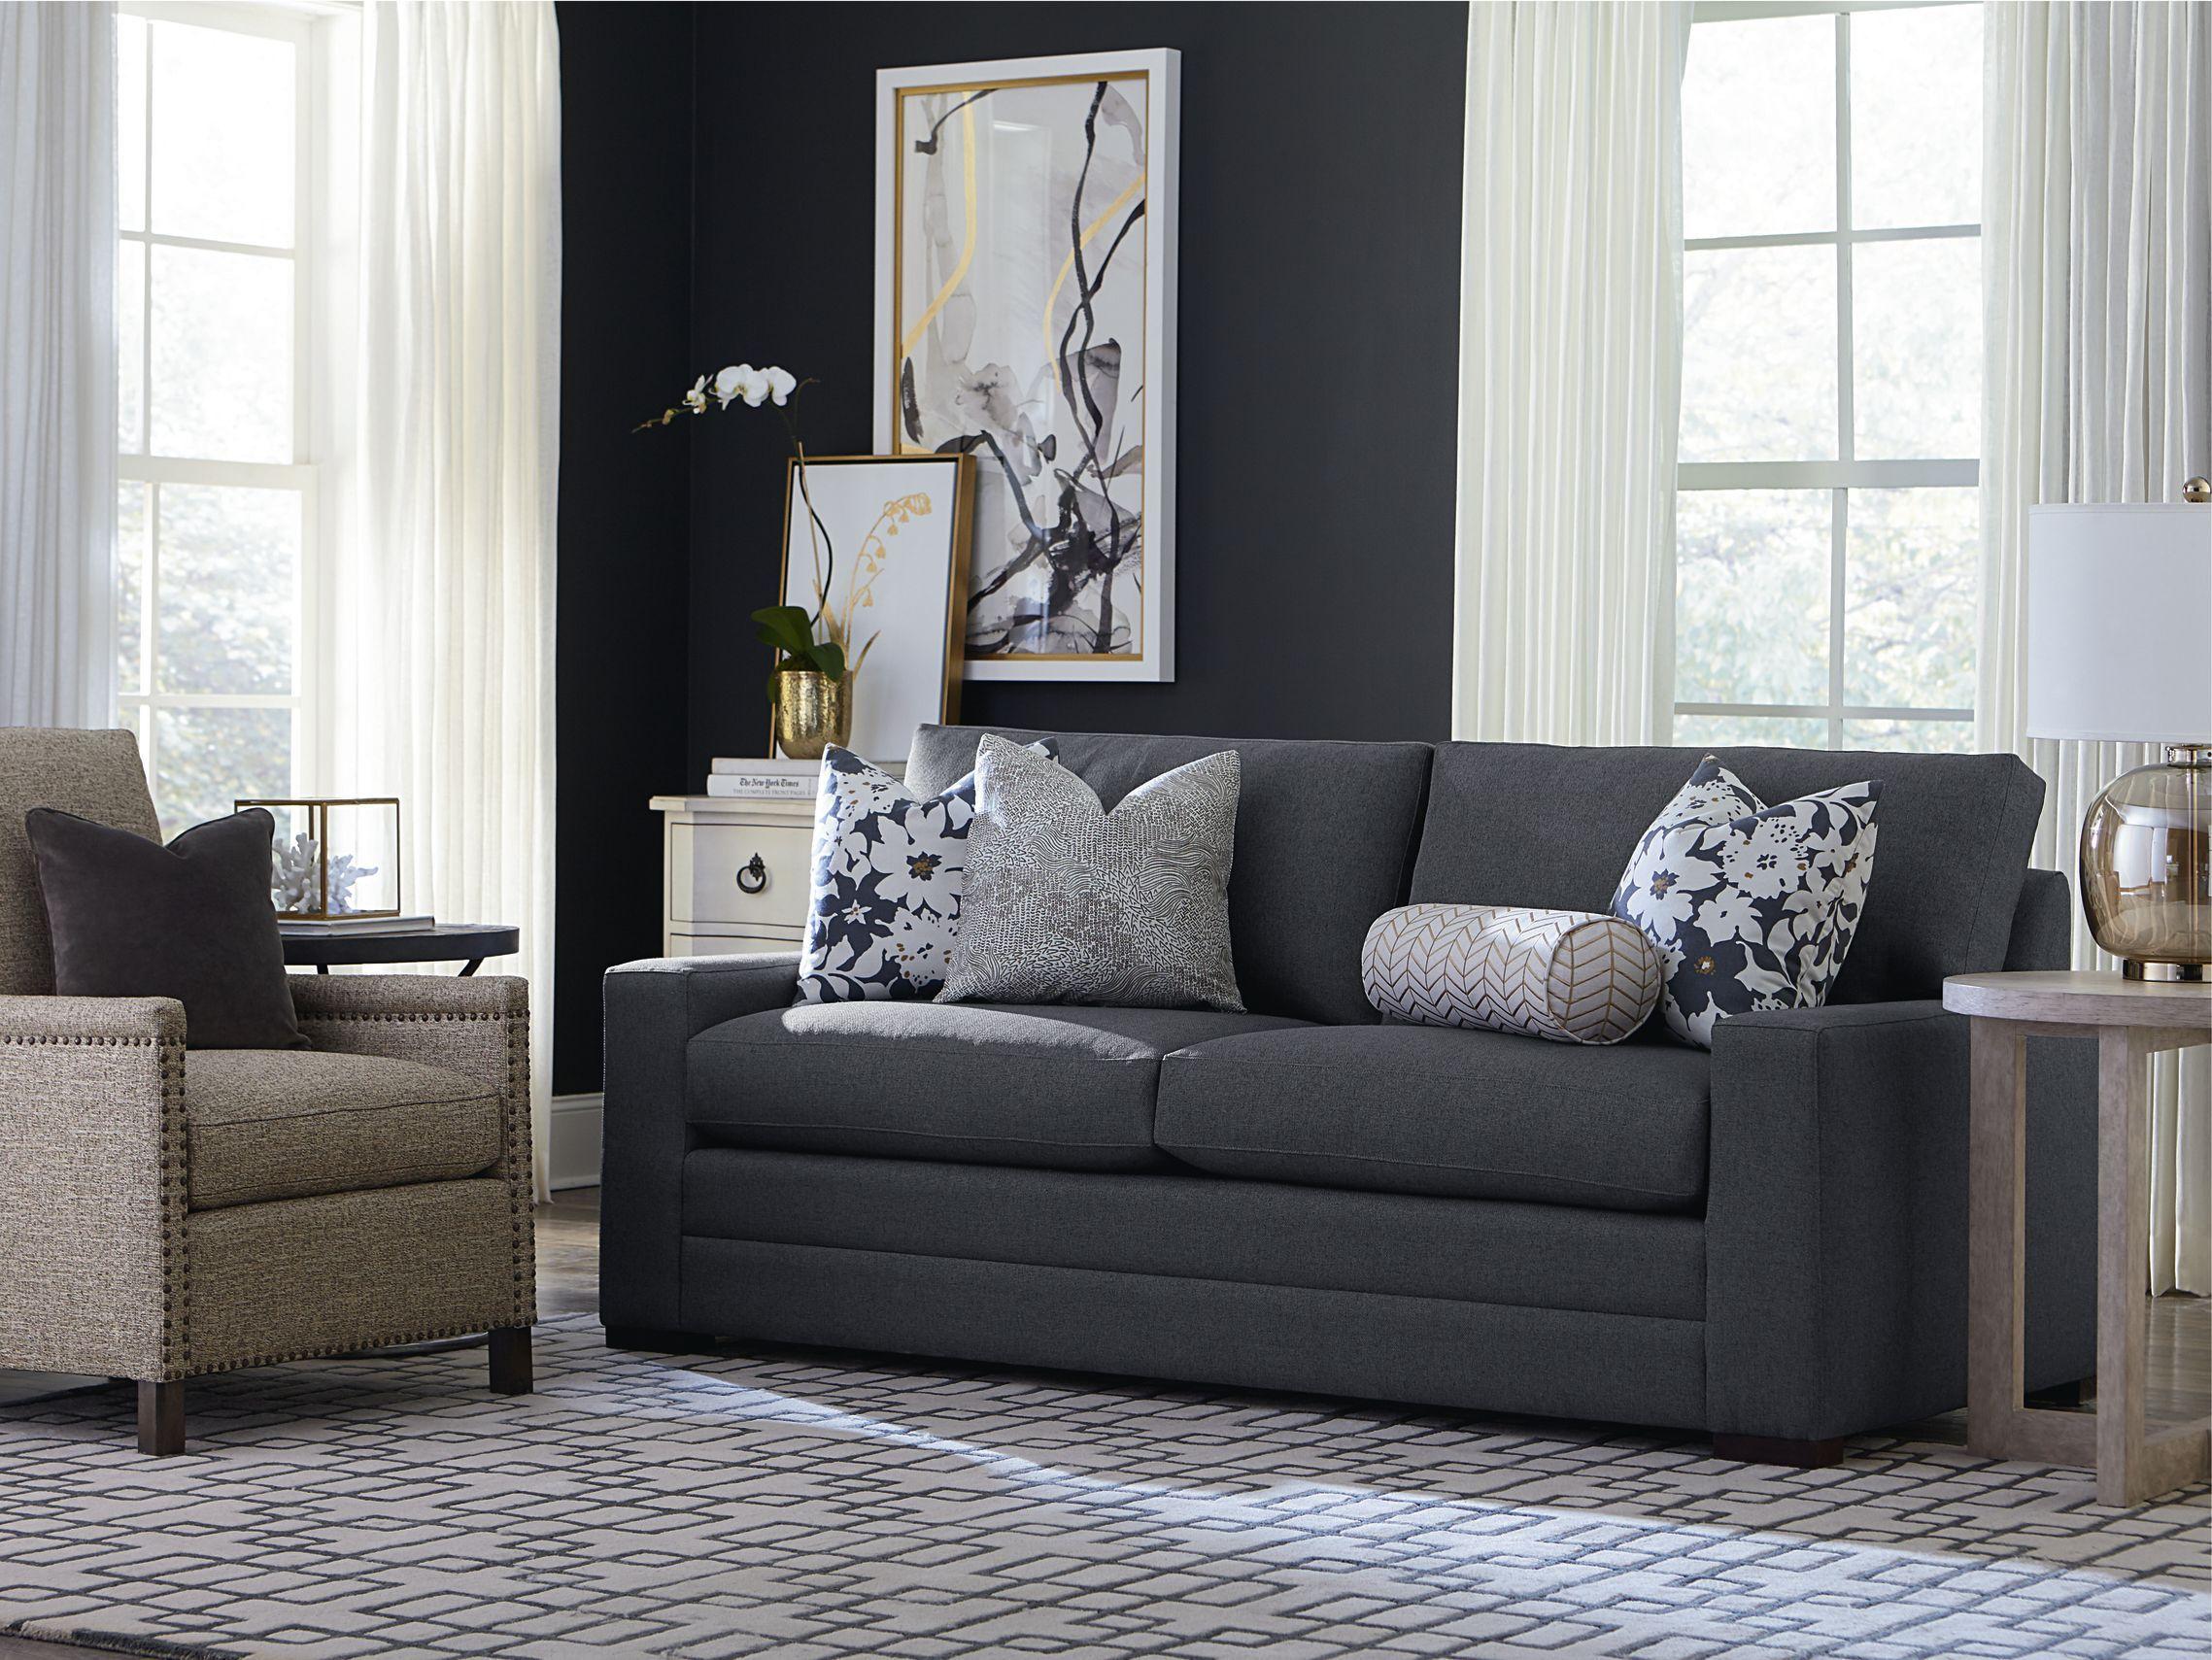 Braylen Sofa Living Room Sofa Room